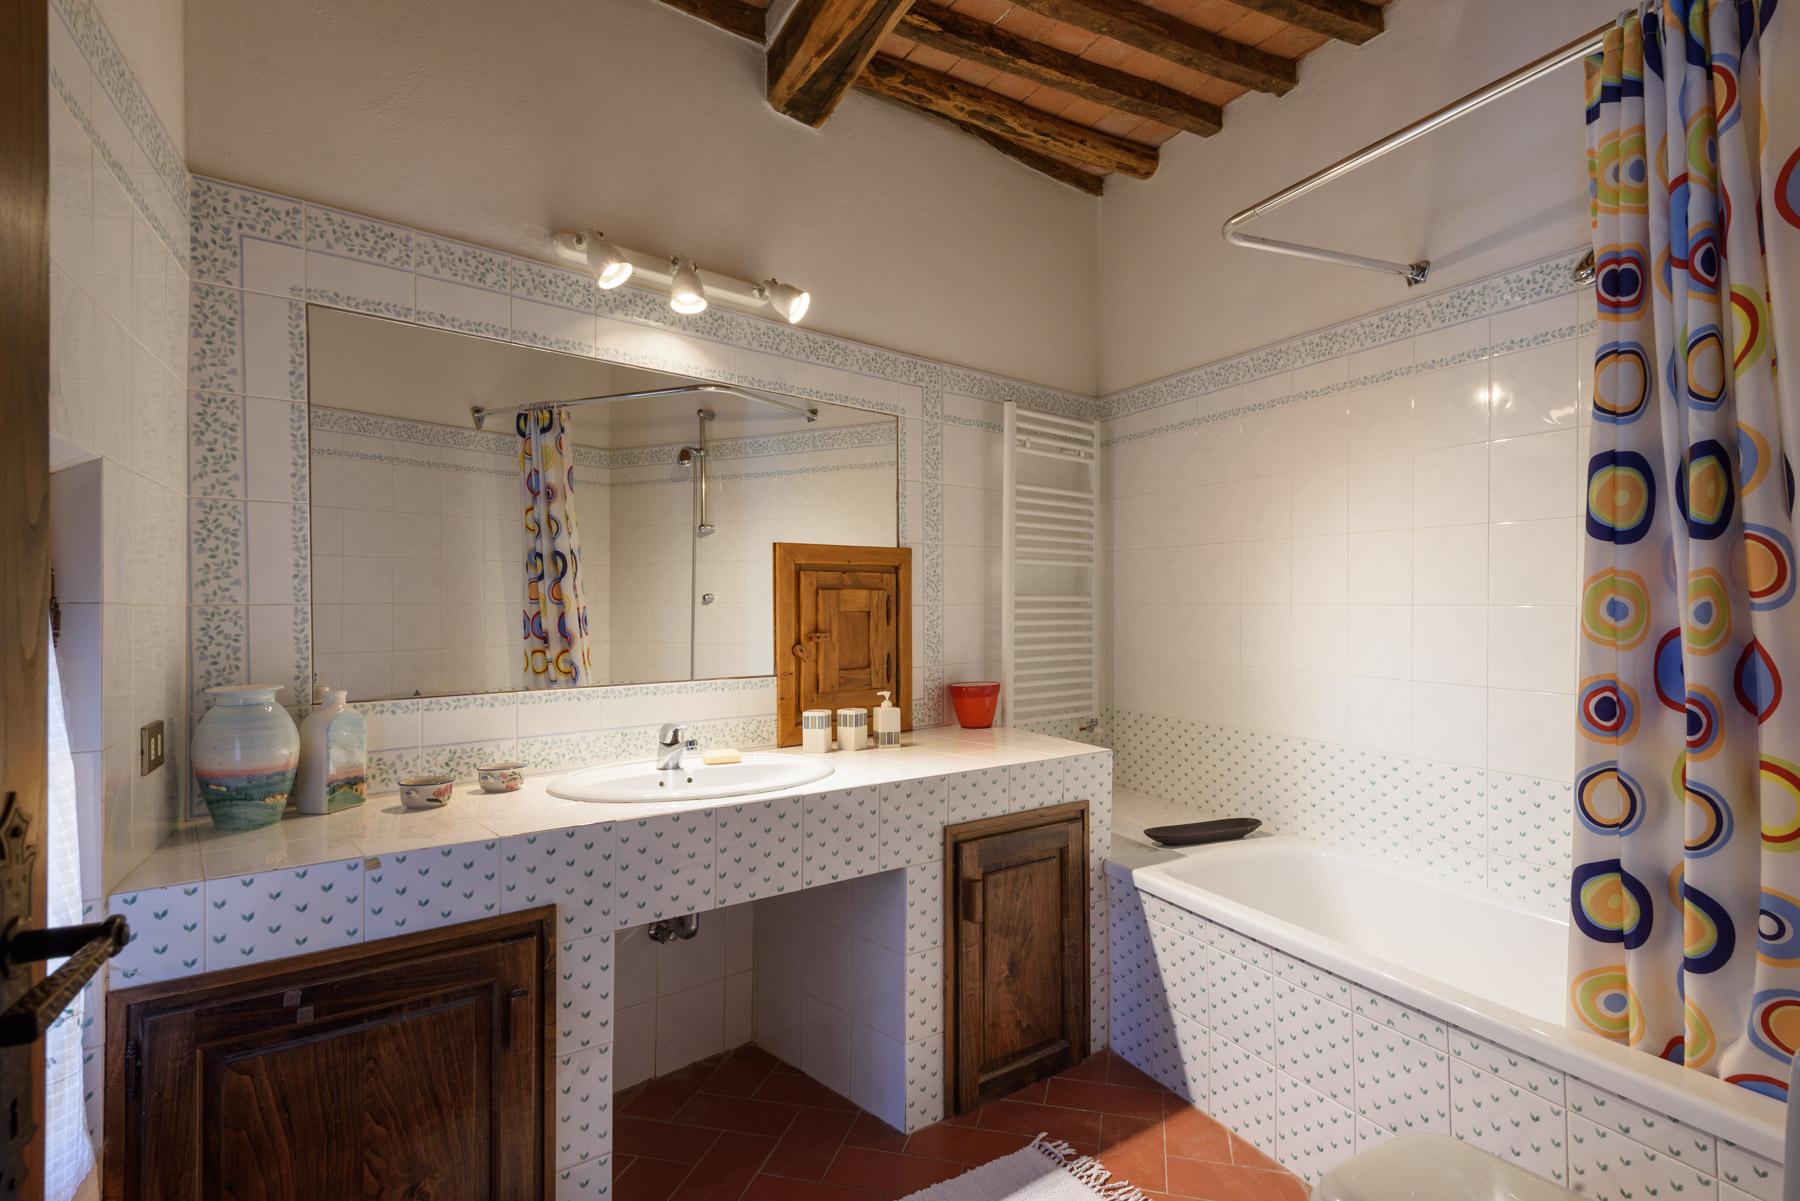 Rustico in Vendita a Castellina In Chianti: 5 locali, 650 mq - Foto 19